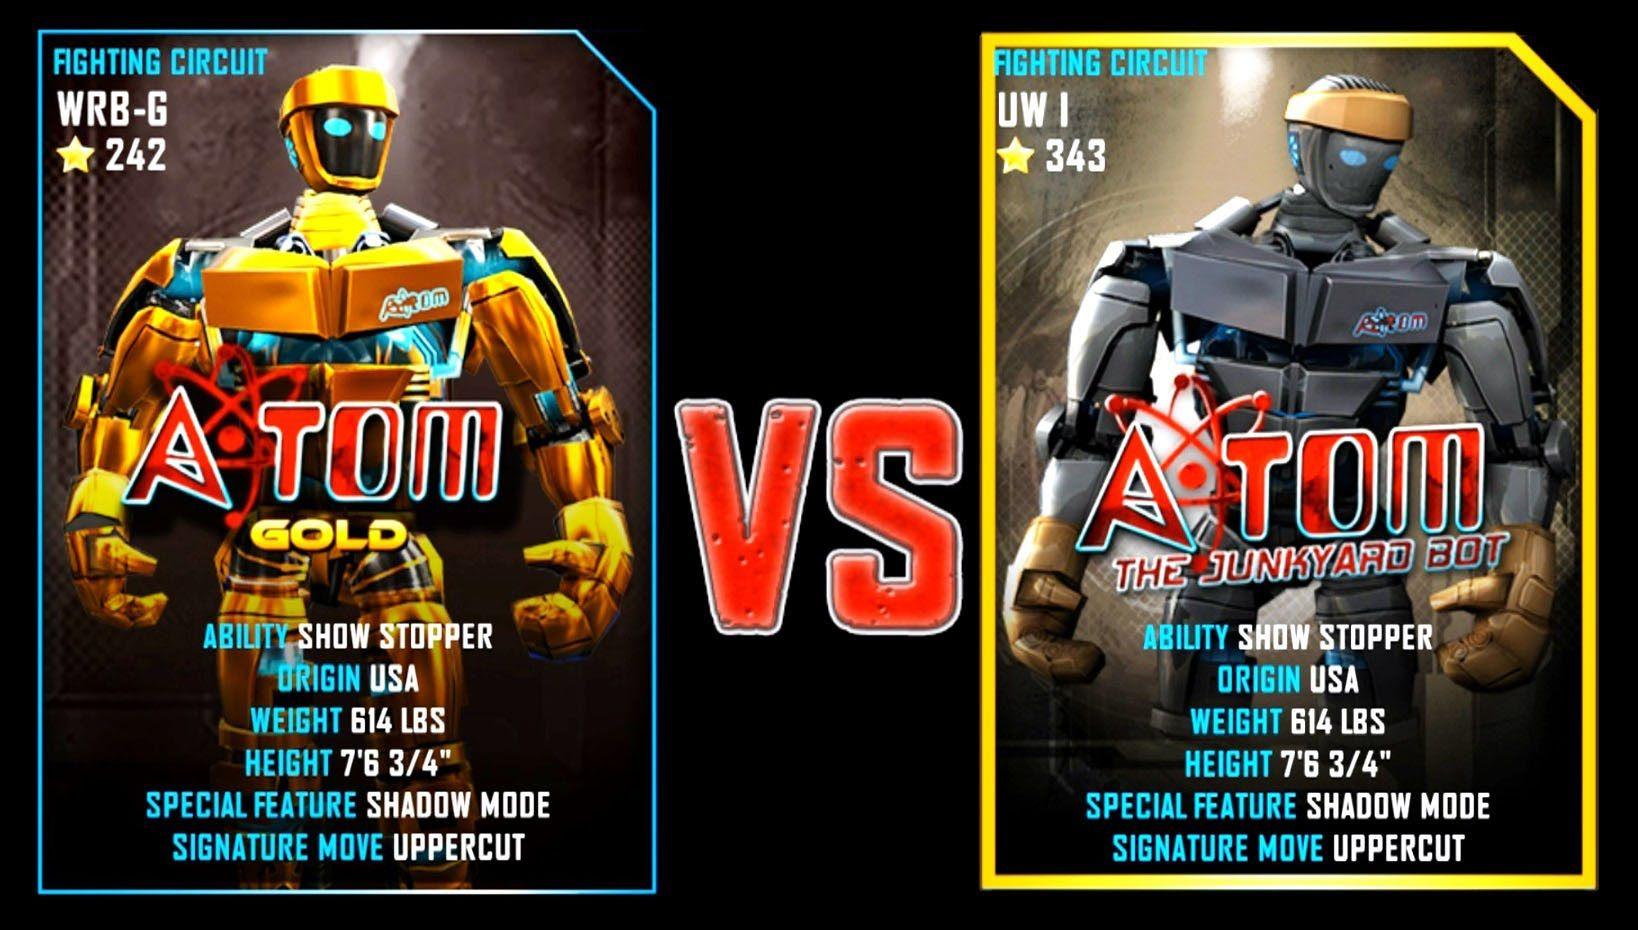 REAL STEEL WRB ATOM GOLD (251) VS Atom (343) New Robots